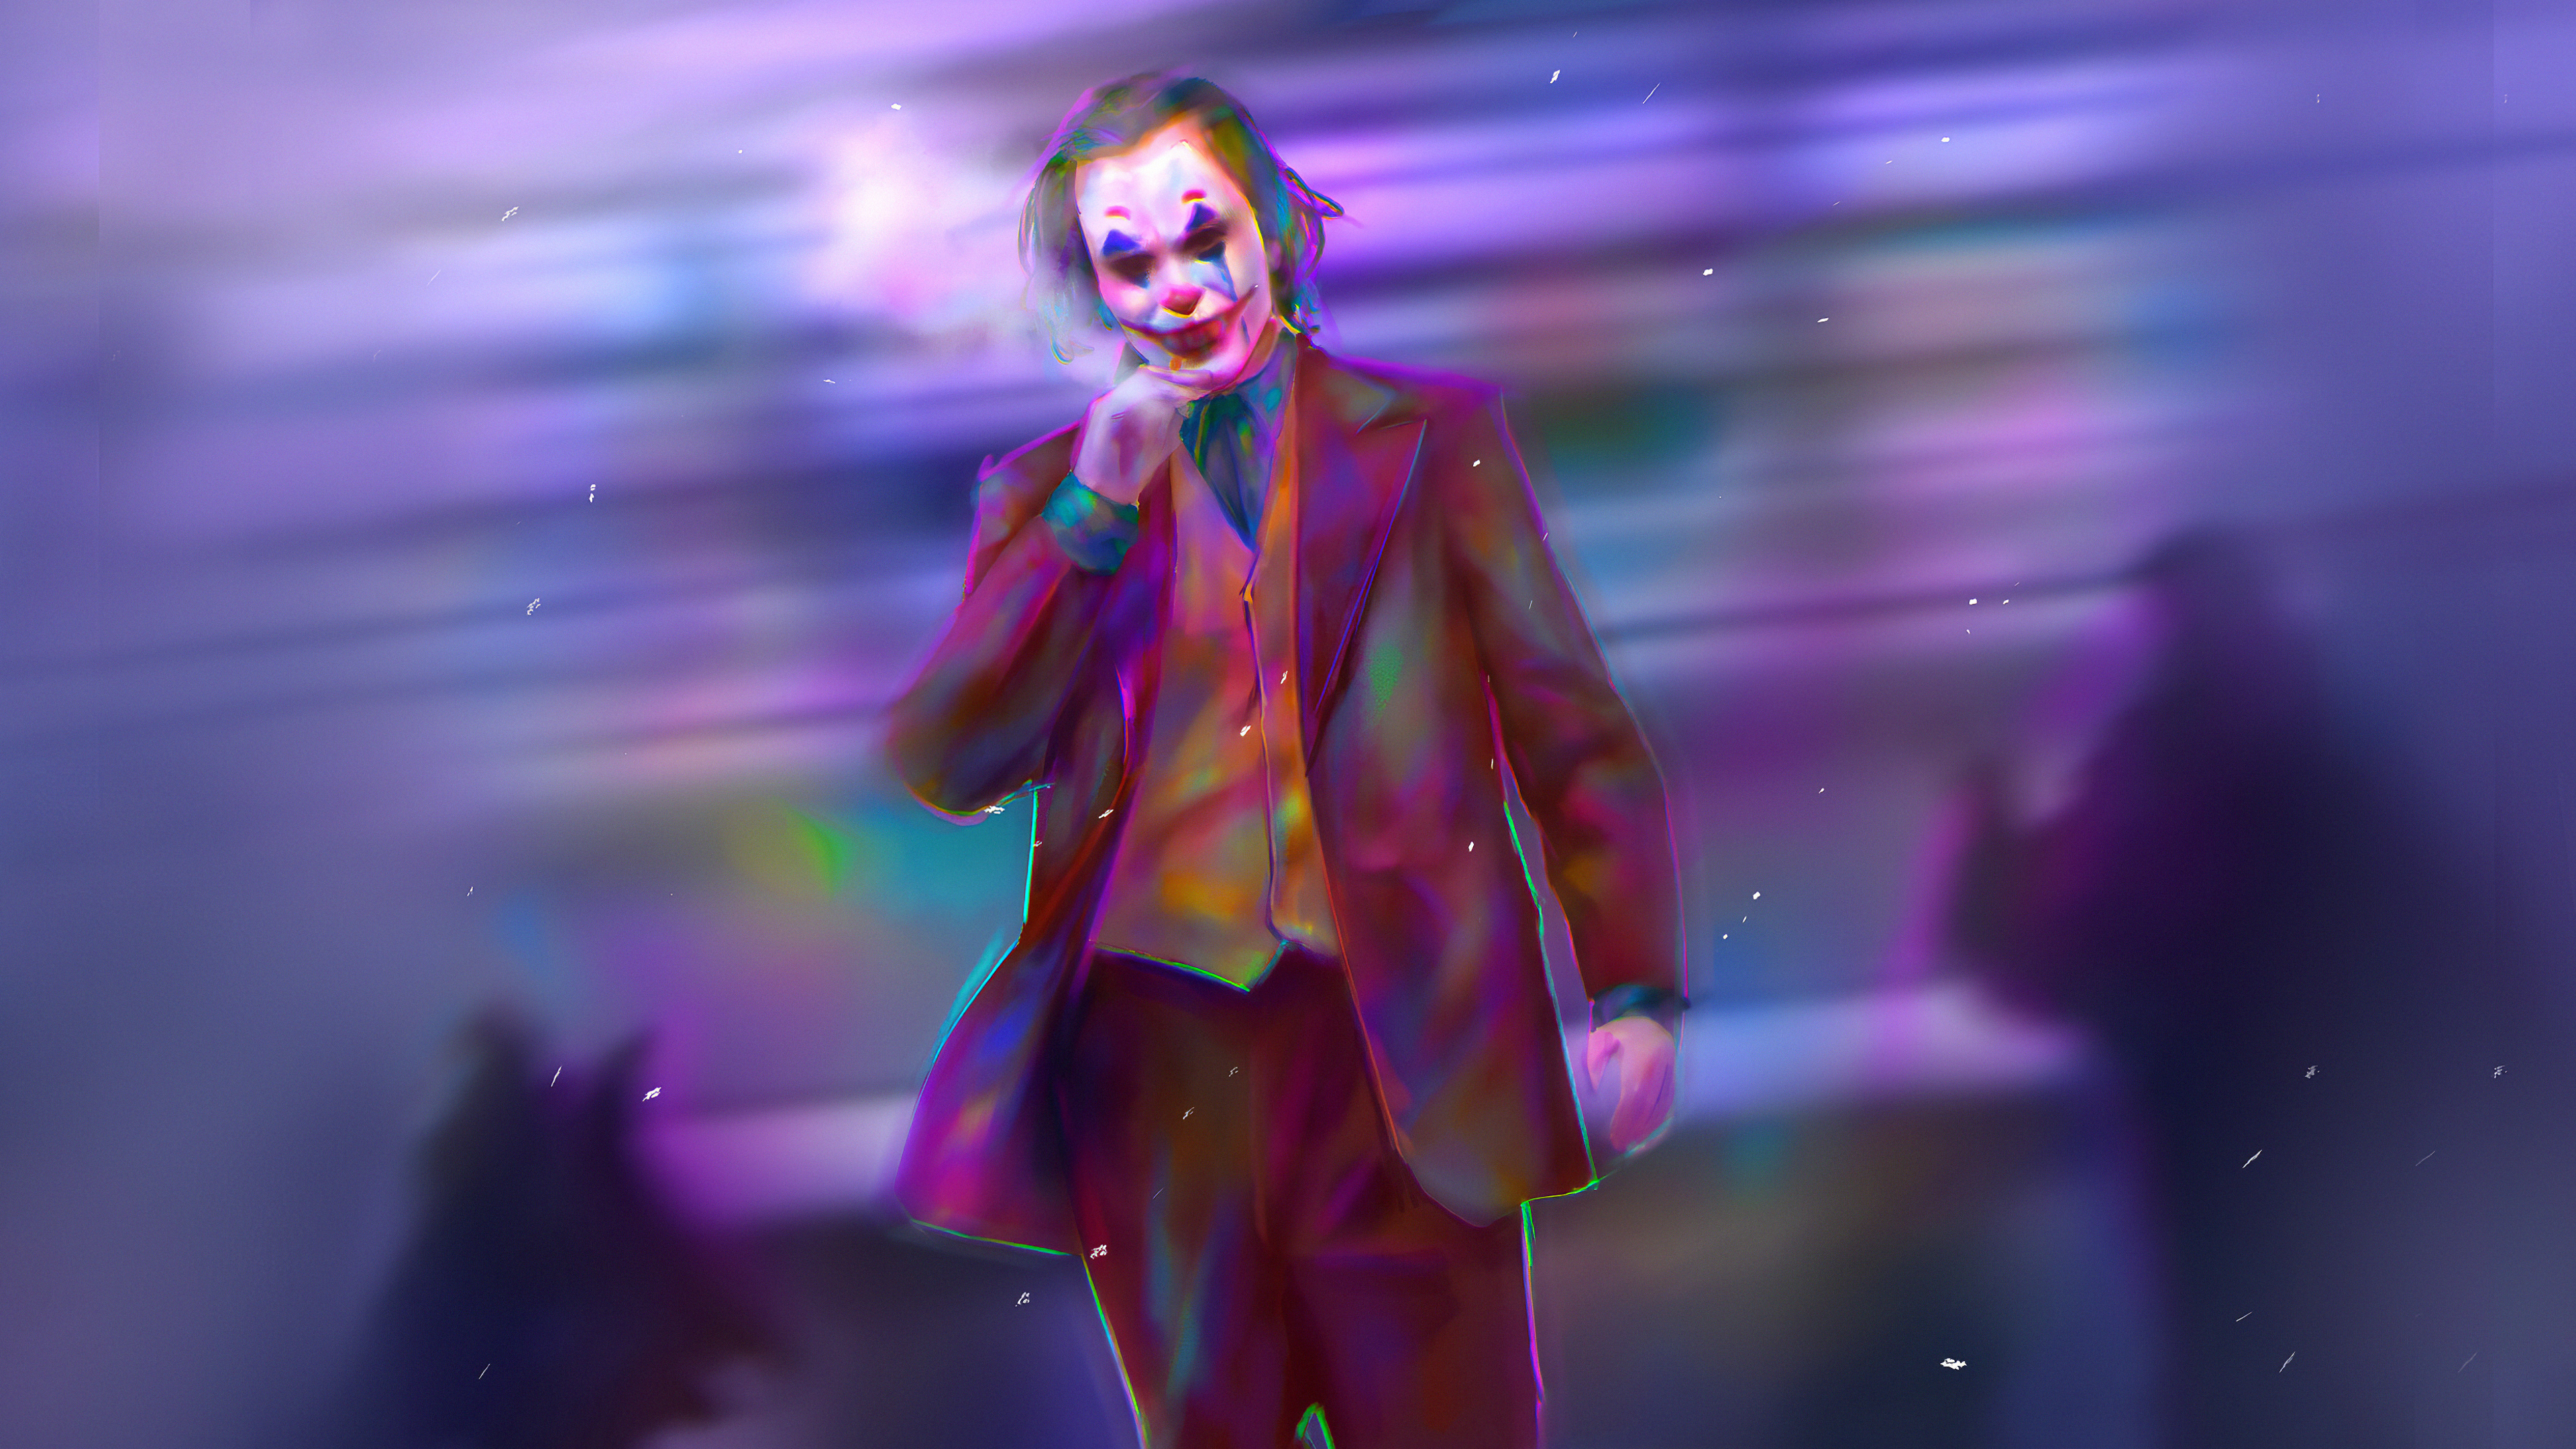 joker colorful art 1572368789 - Joker Colorful Art - supervillain wallpapers, superheroes wallpapers, joker wallpapers, joker movie wallpapers, hd-wallpapers, 4k-wallpapers